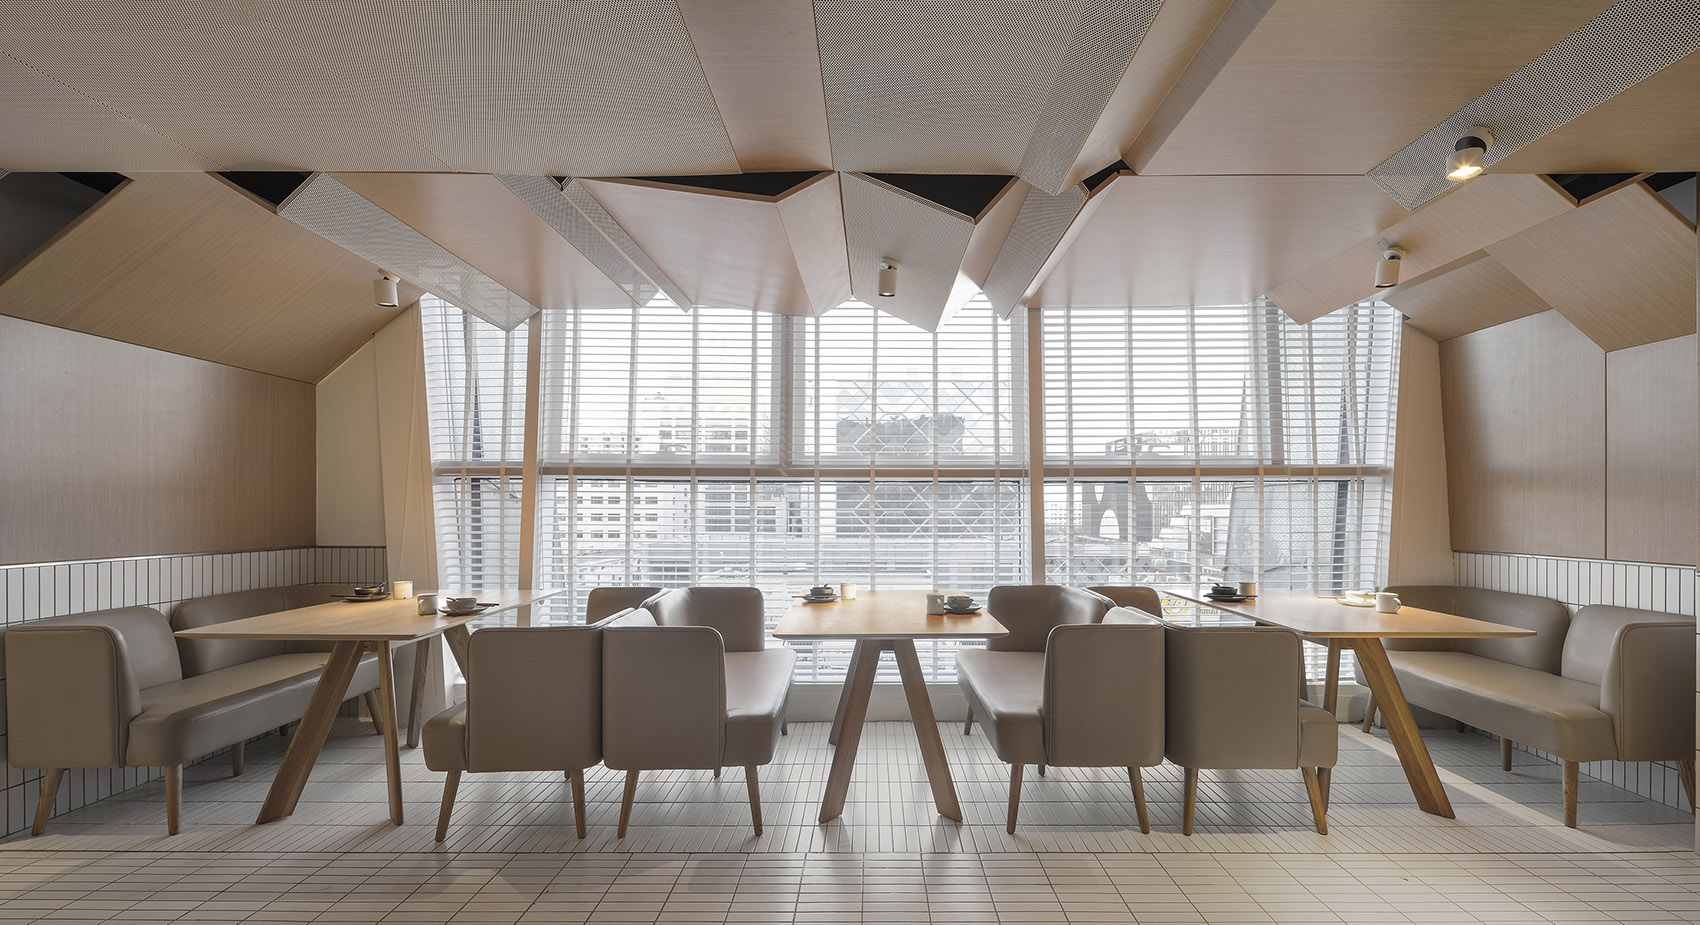 003-goose-hut-home-bistro-china-by-golucci-interior-architects.jpg